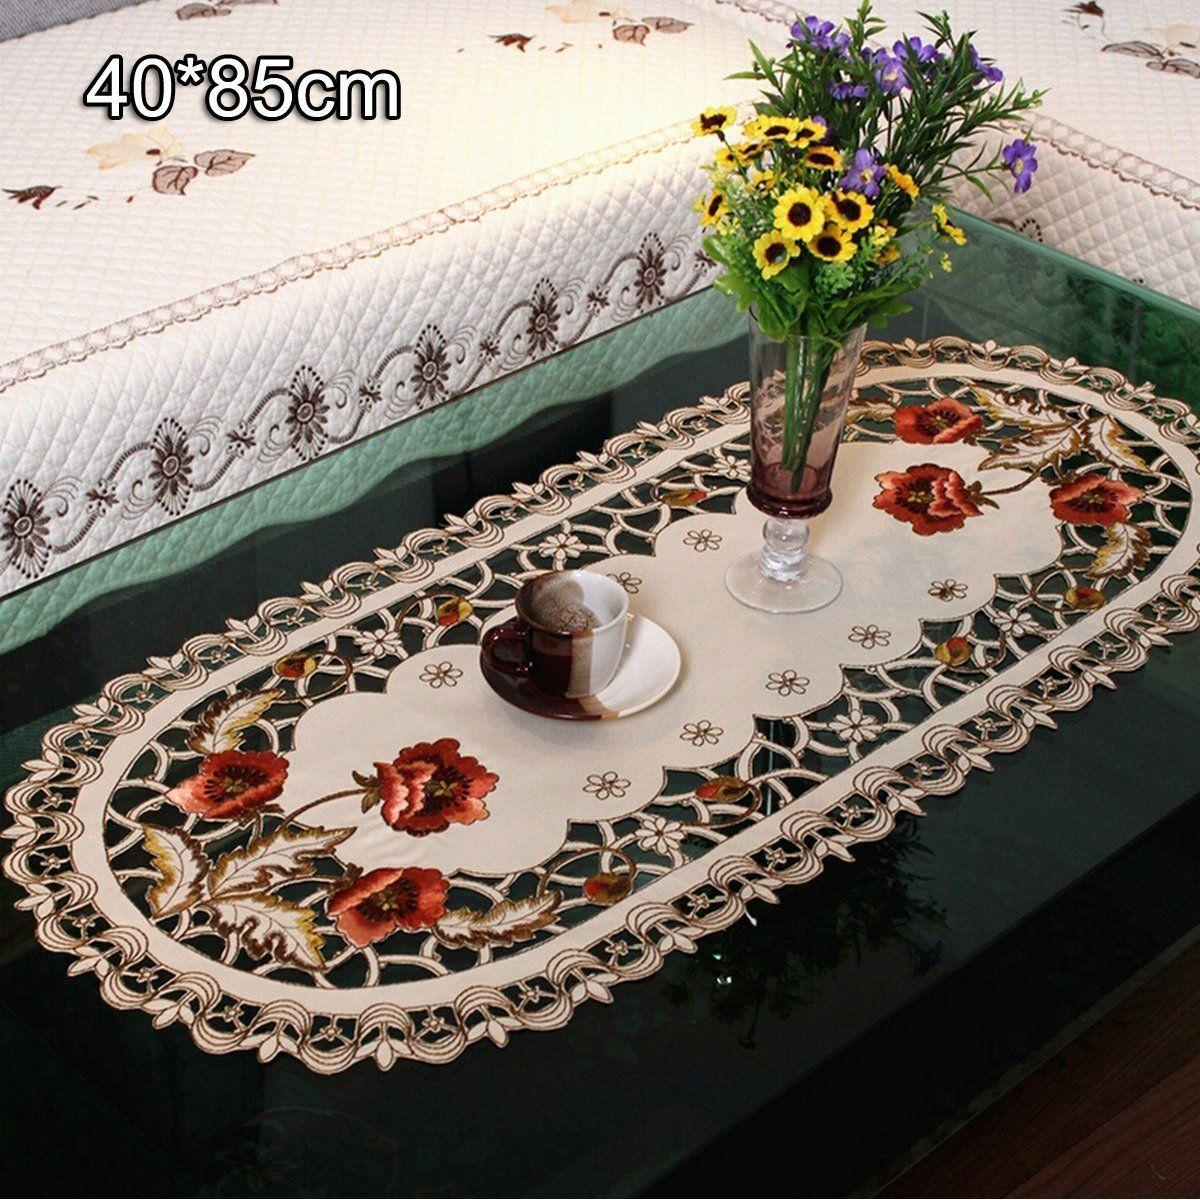 yesurprise 1pcs nappe de table ovale modèle 229 beige broderie 40